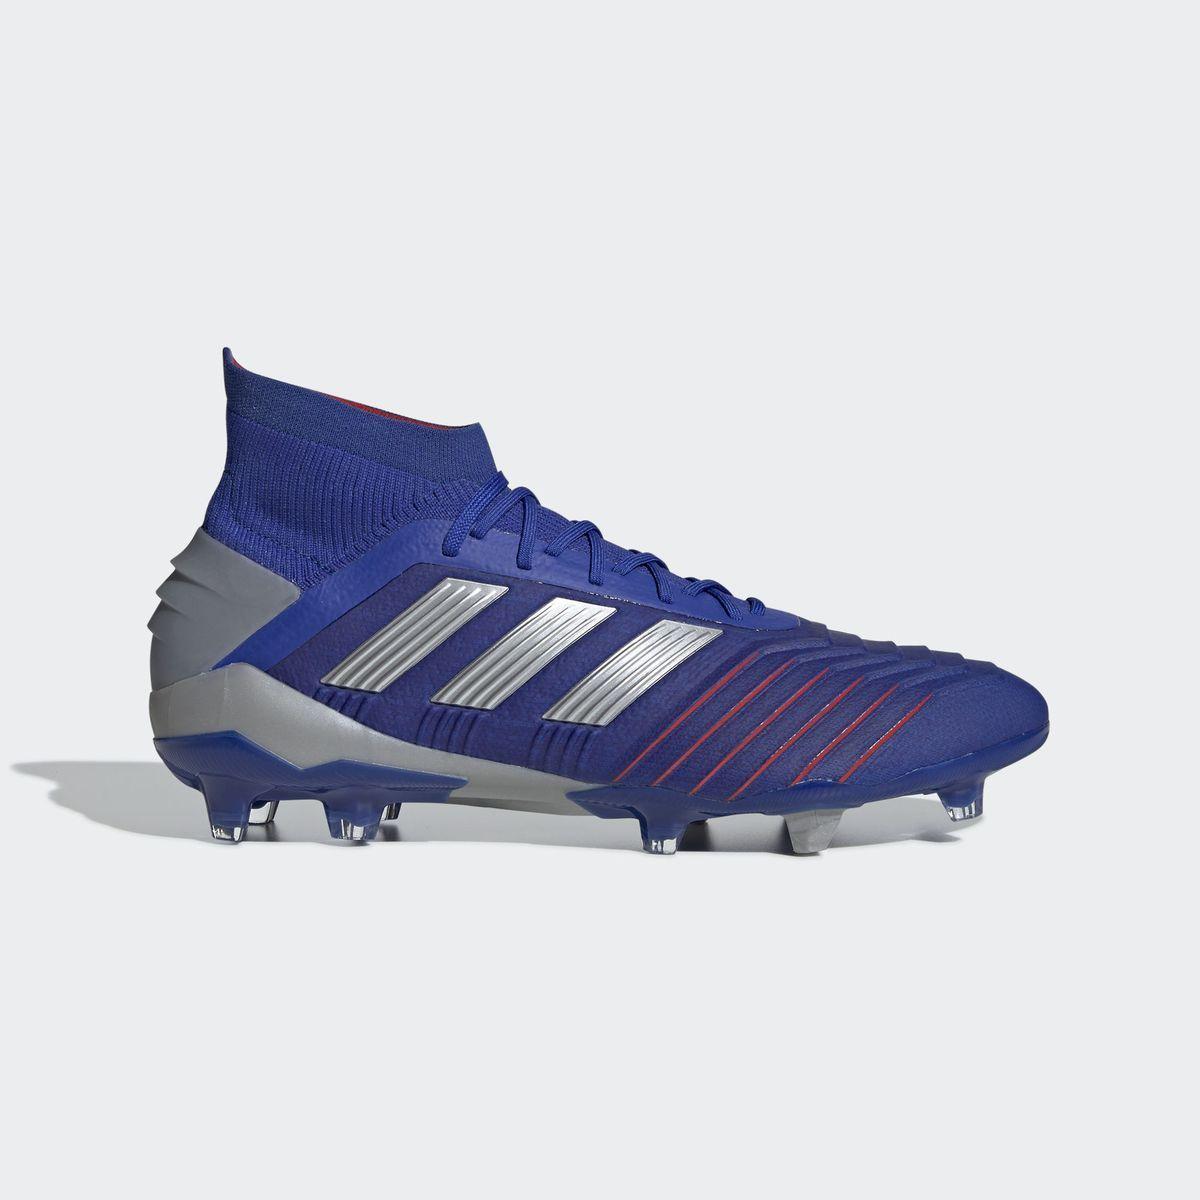 Chaussure Predator Fg Adidas Taille : 45 13 Chaussures